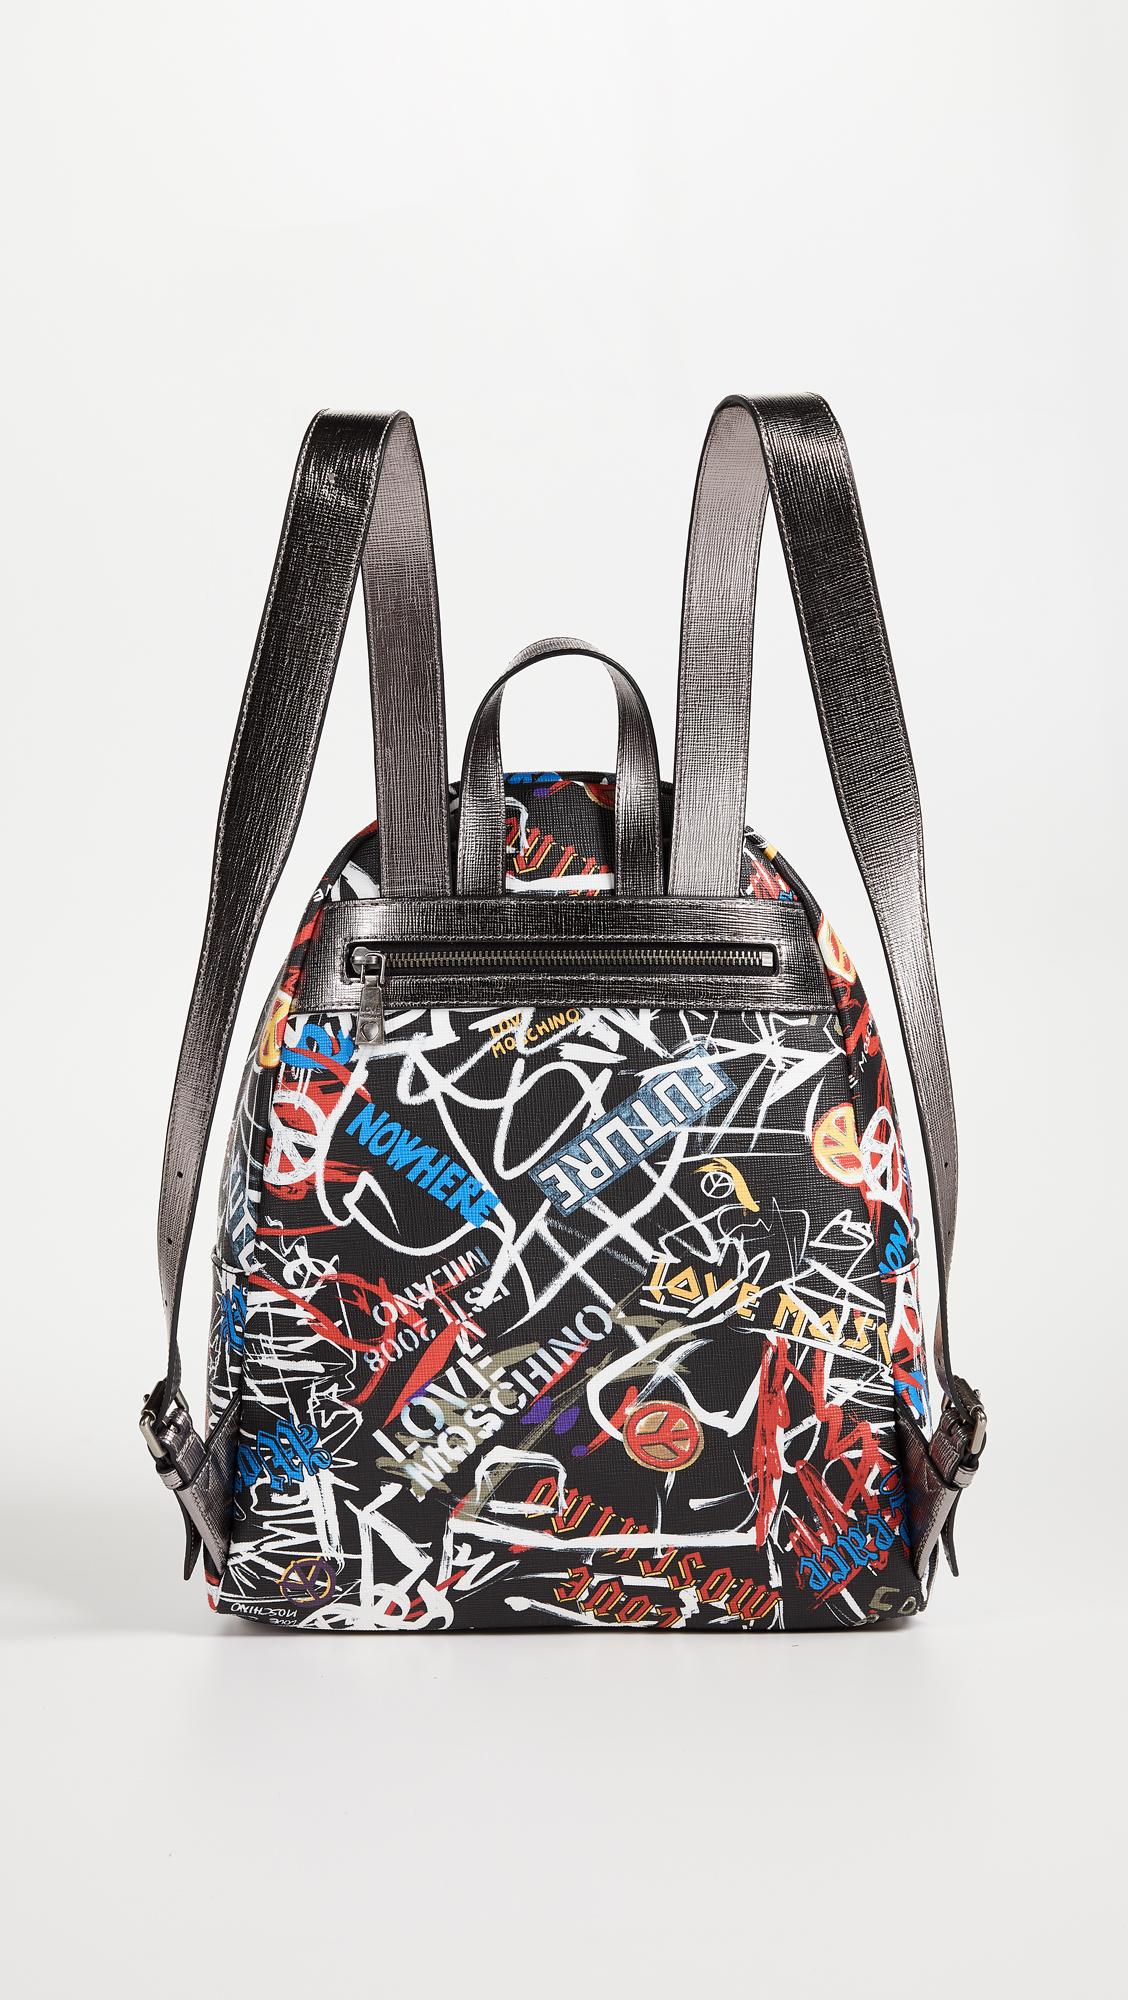 54f6a199840 Moschino Love Moschino Graffiti Backpack   SHOPBOP